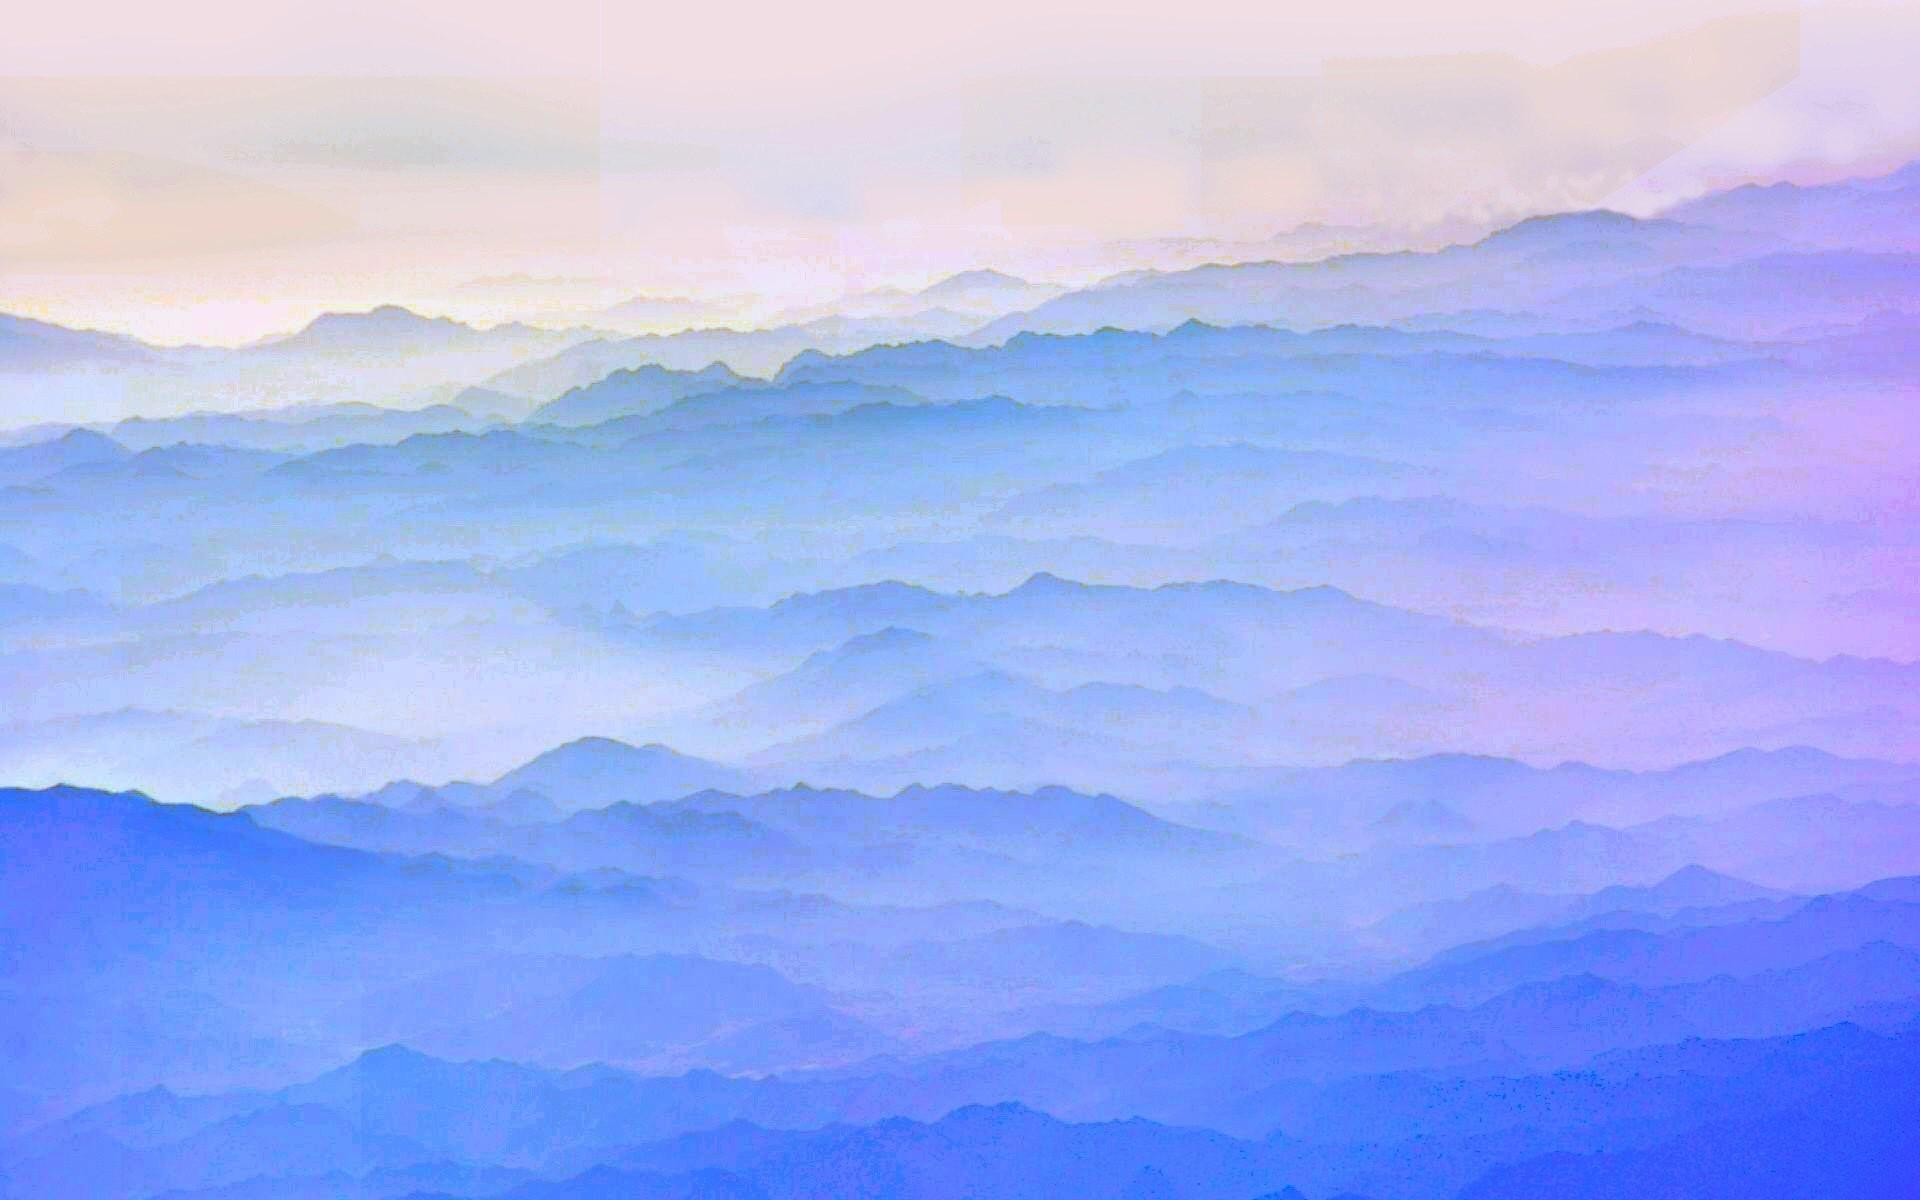 Pastel Wallpaper (71+ images)